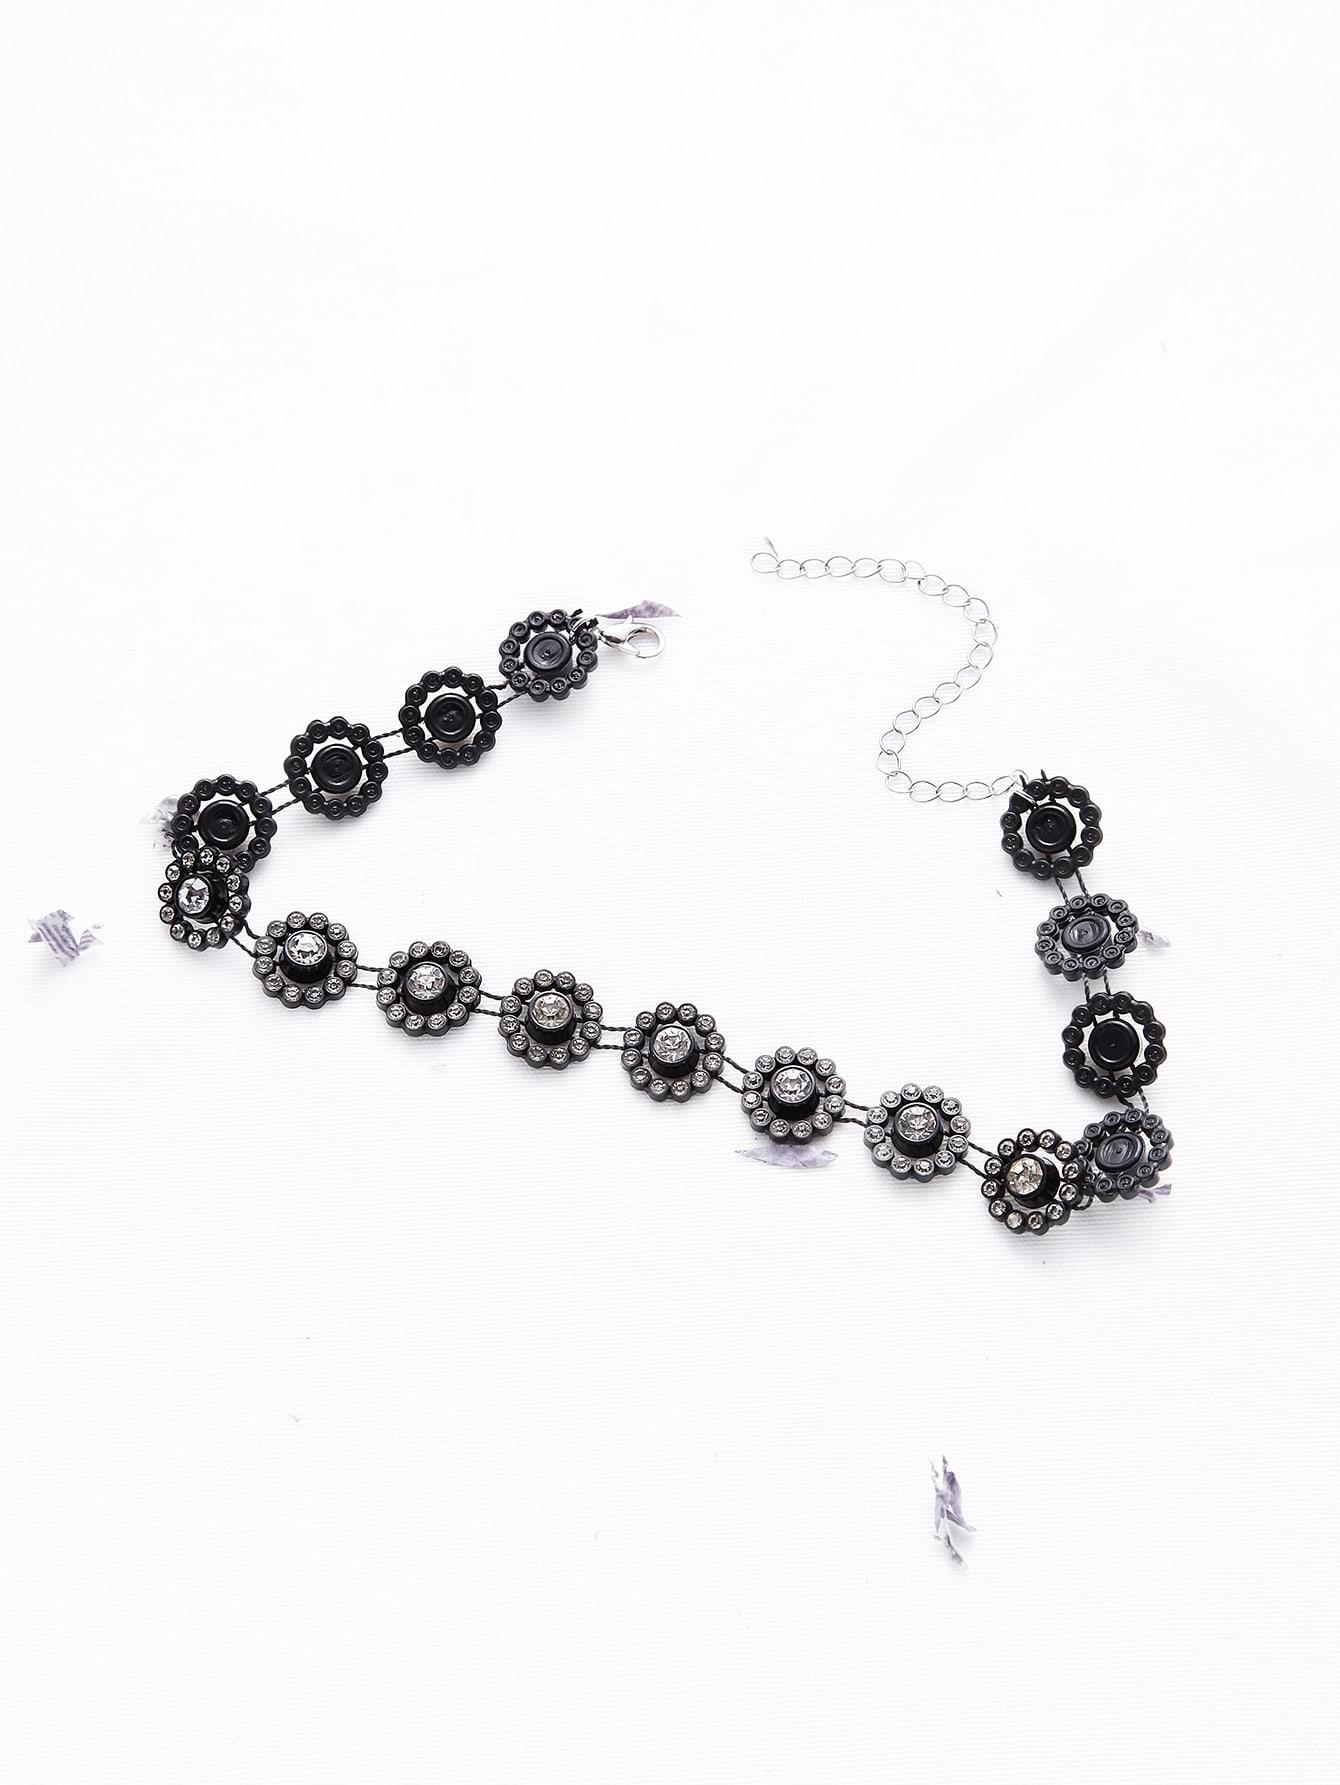 Black Flower Shaped Rhinestone Statement Choker necklaceNC170318305